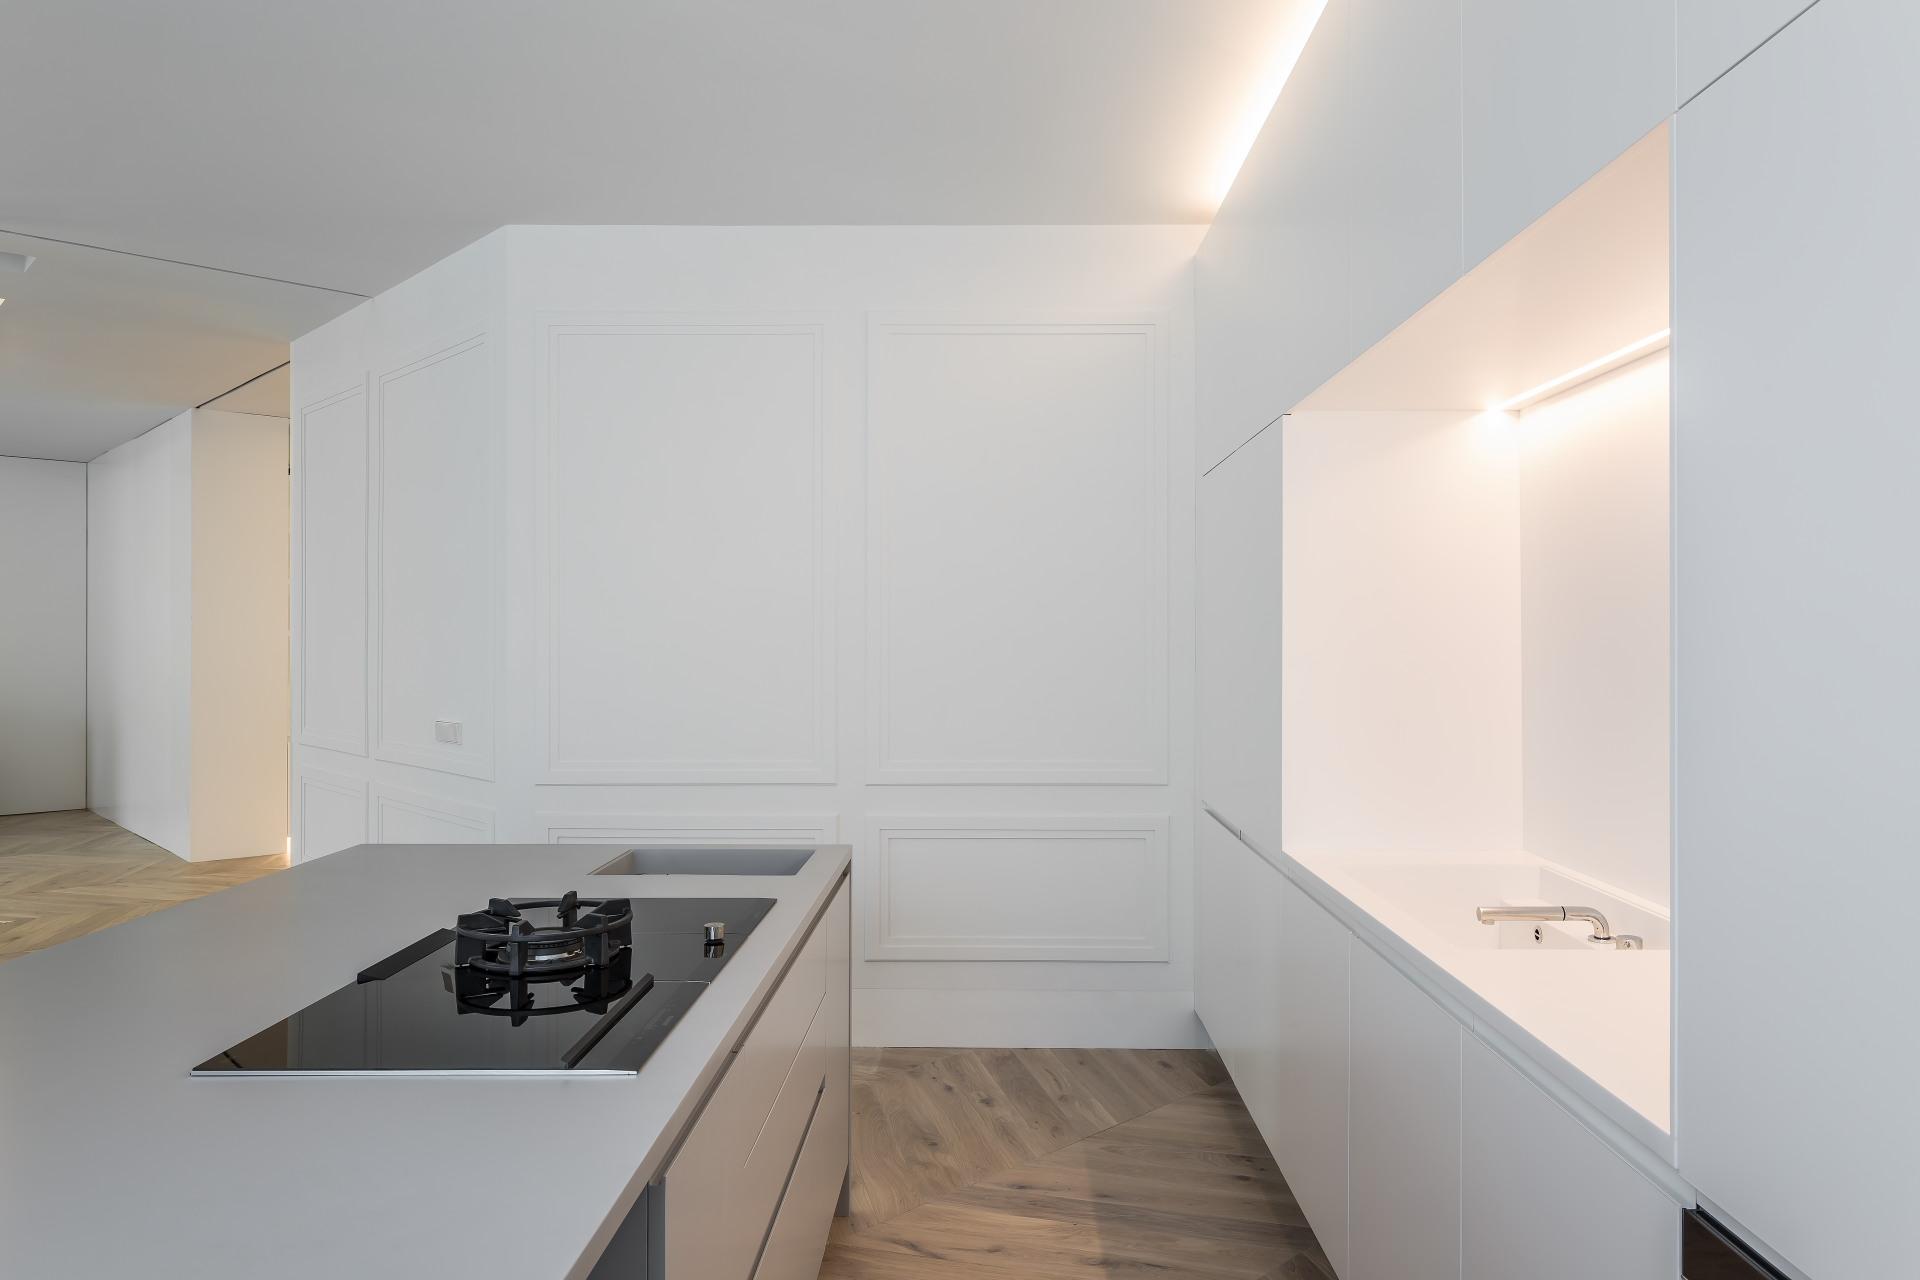 fotografia-arquitectura-valencia-german-cabo-gallardo-llopis-bfm-edificatoria-turia01 (28)